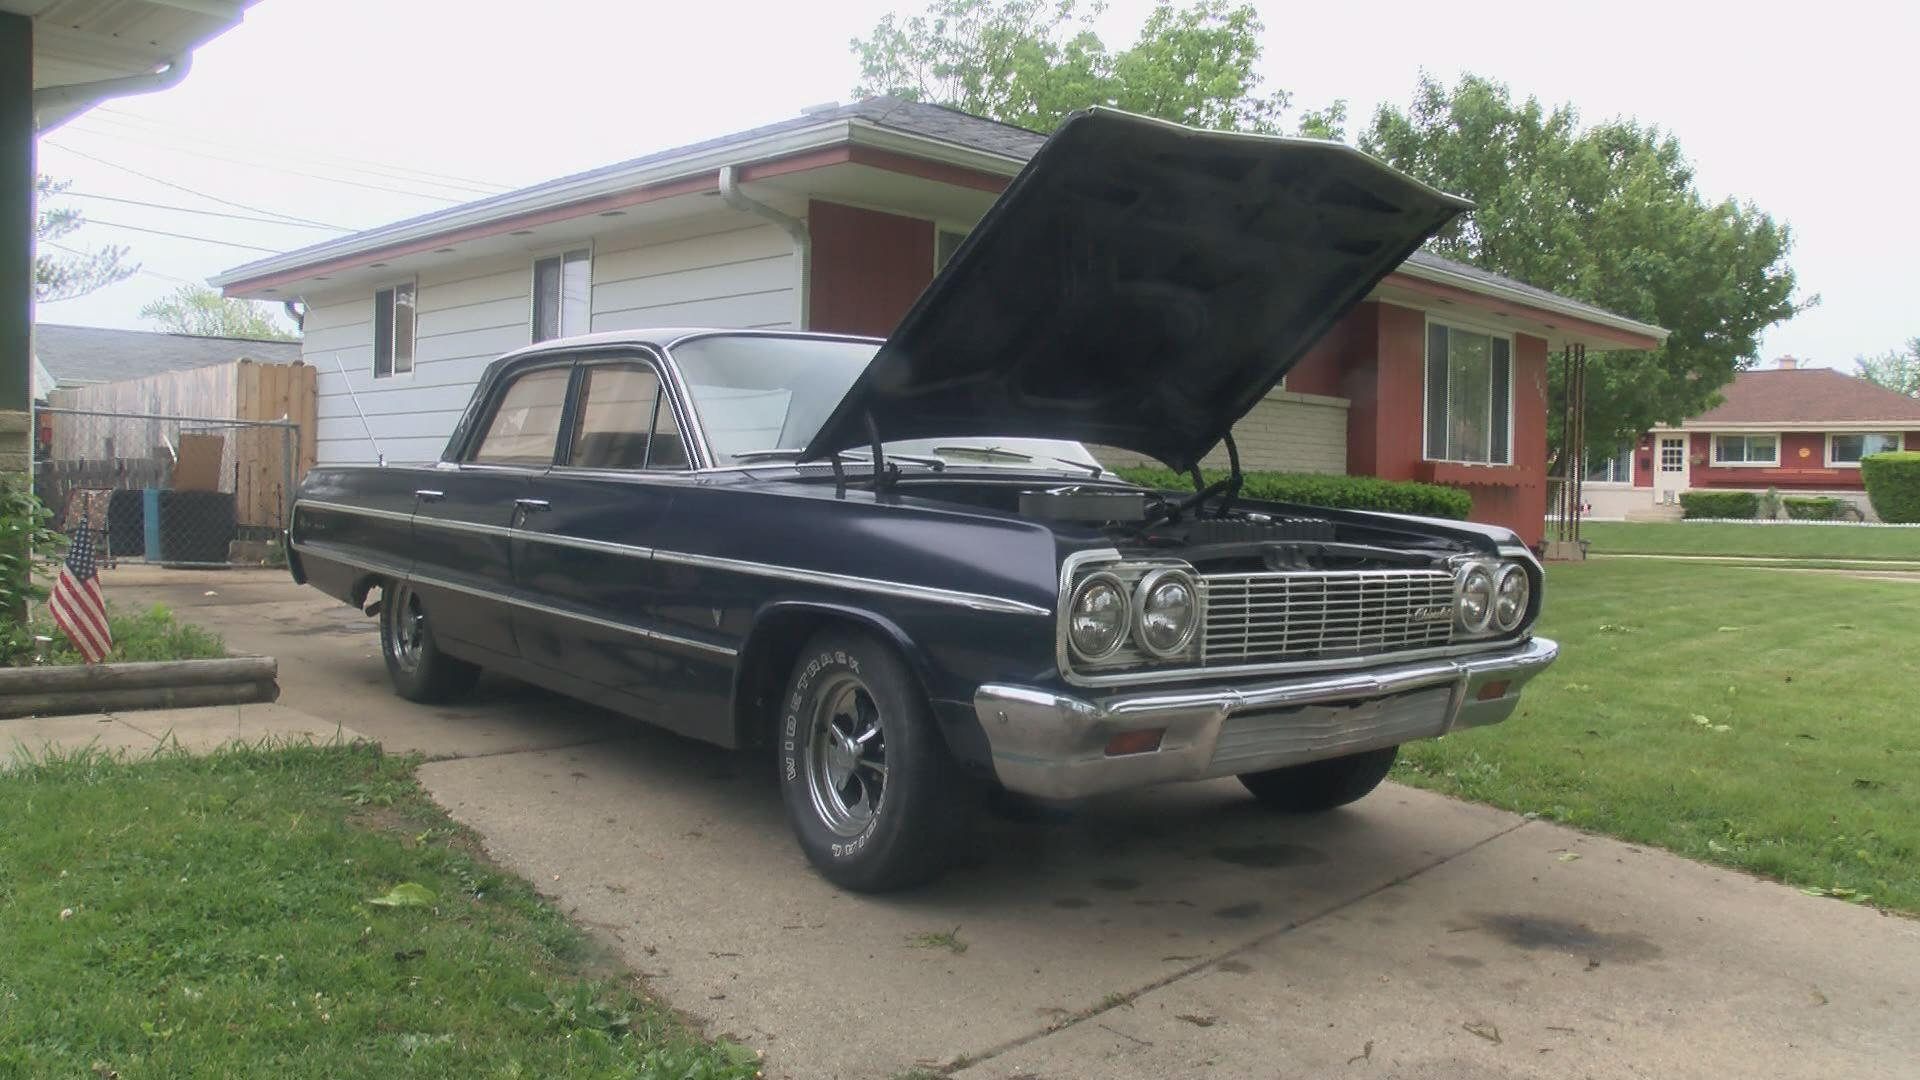 Racine man rebuilding classic car for Veteran, surprise planned